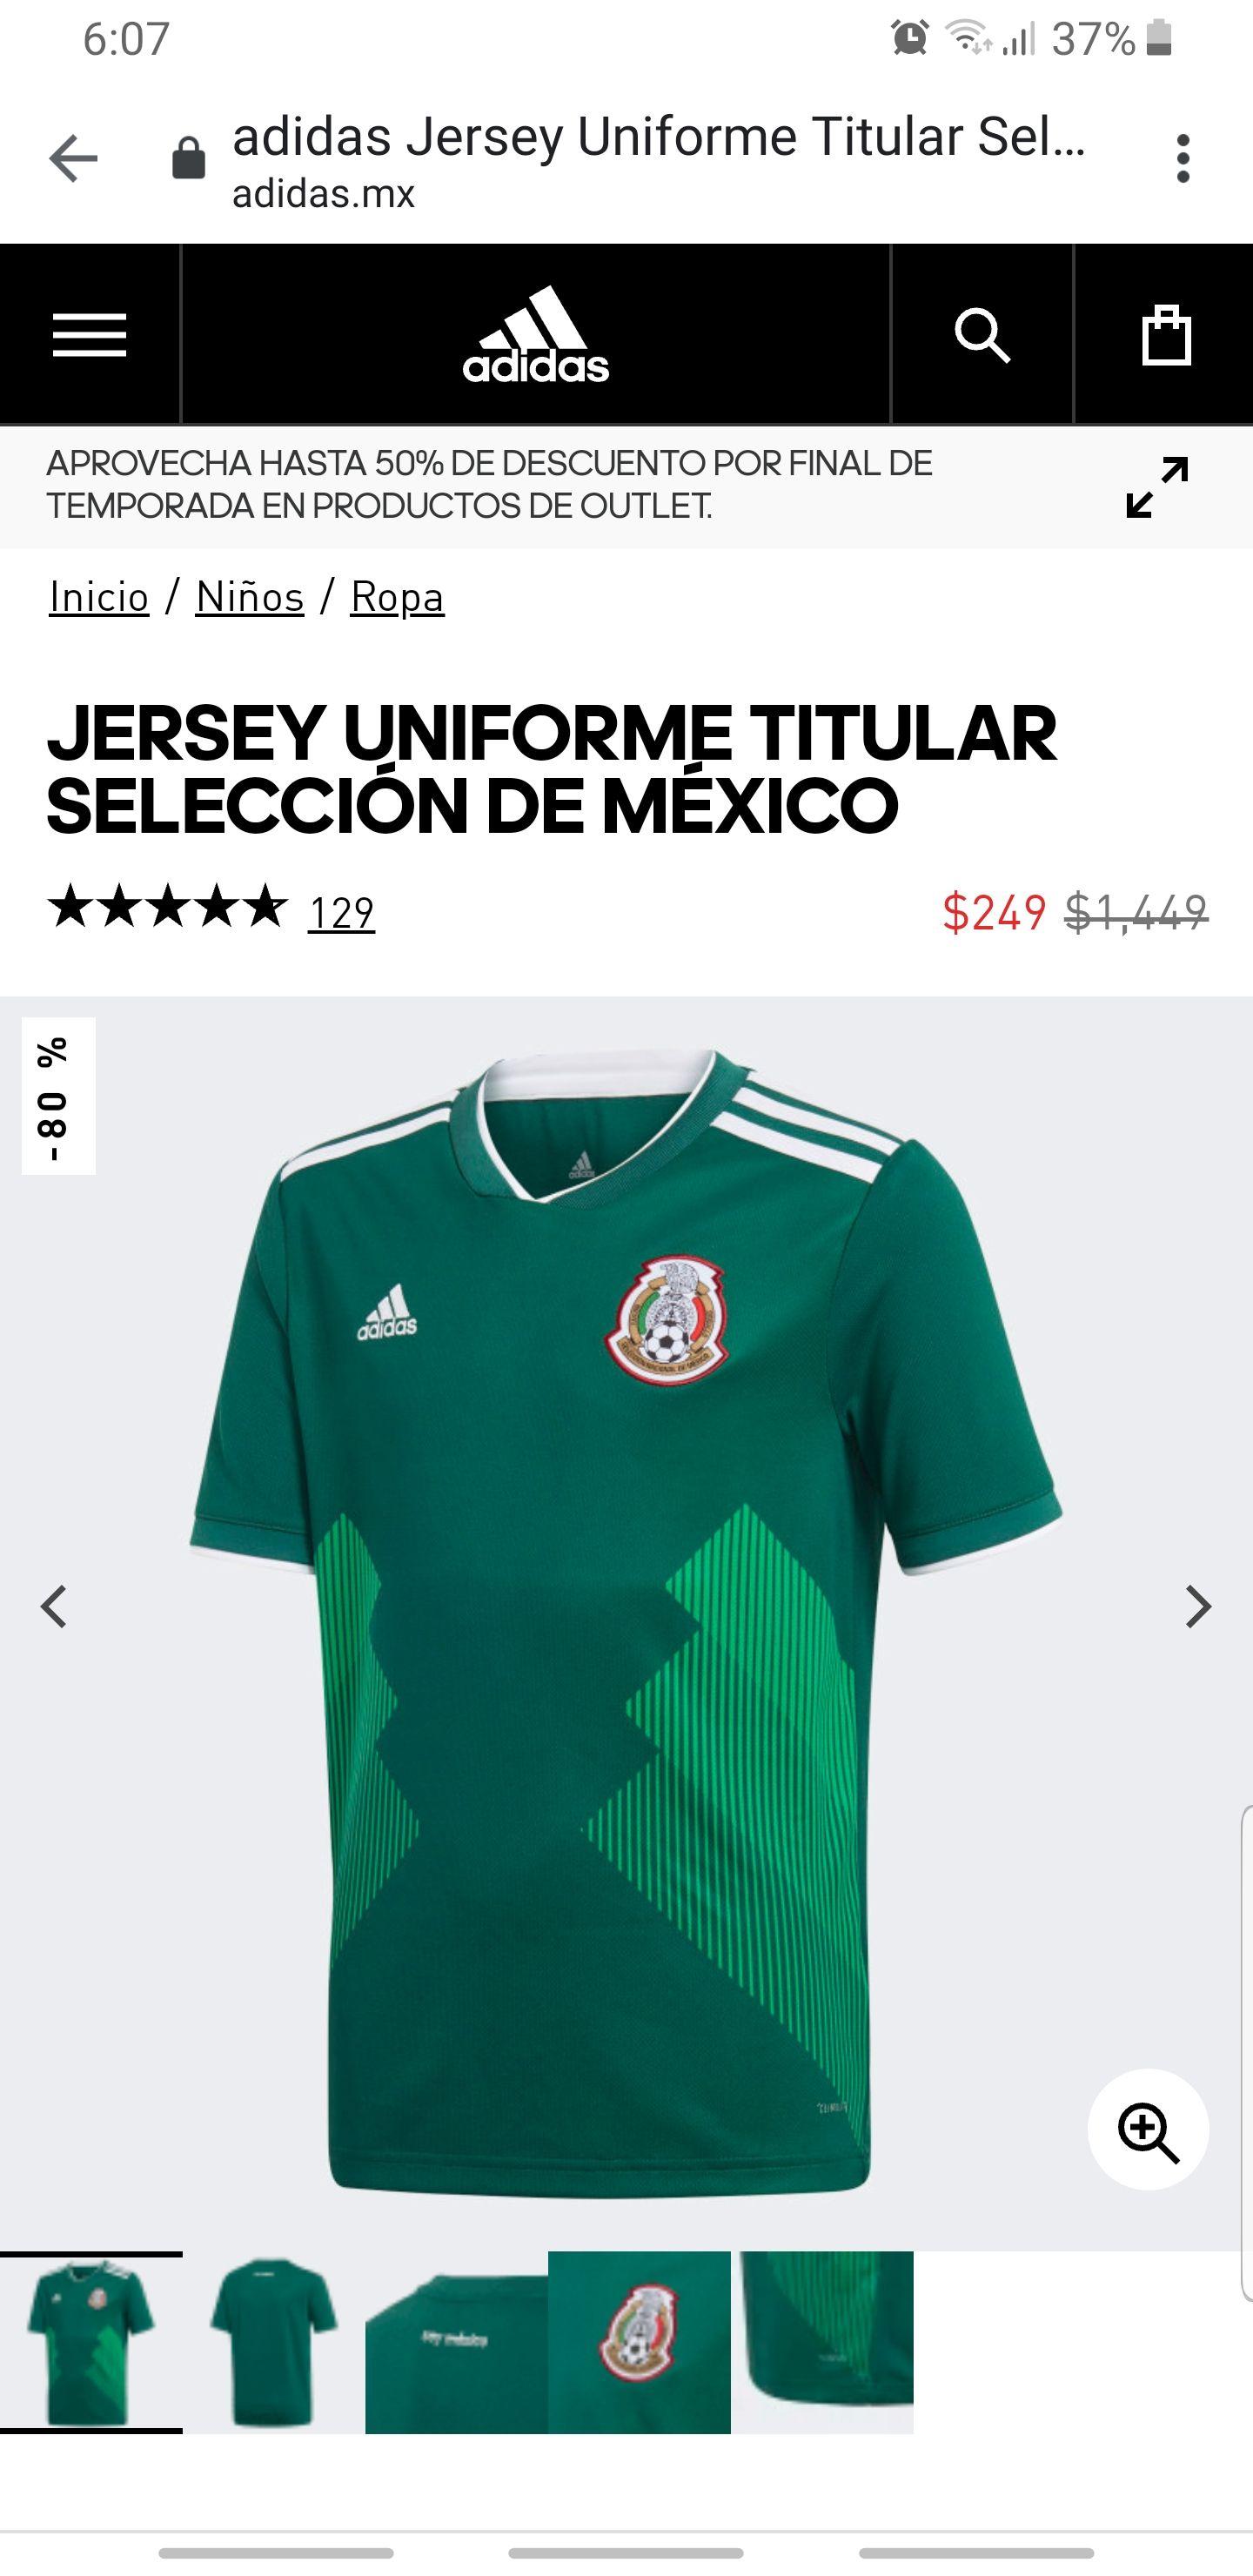 Adidas: Jersey